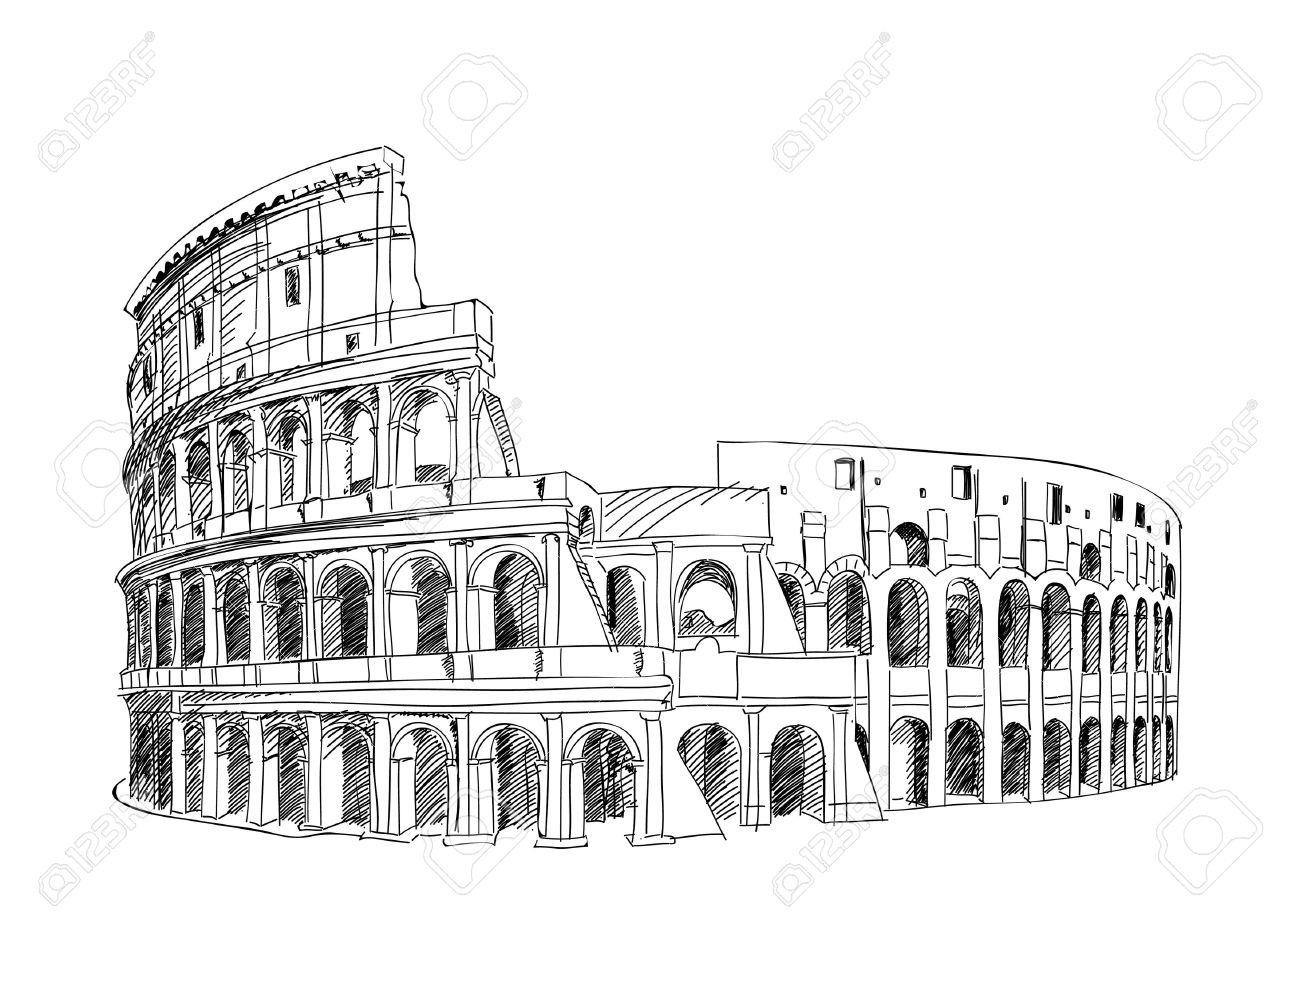 Coliseo En Roma Italia Señal De Coliseum Dibujado A Mano